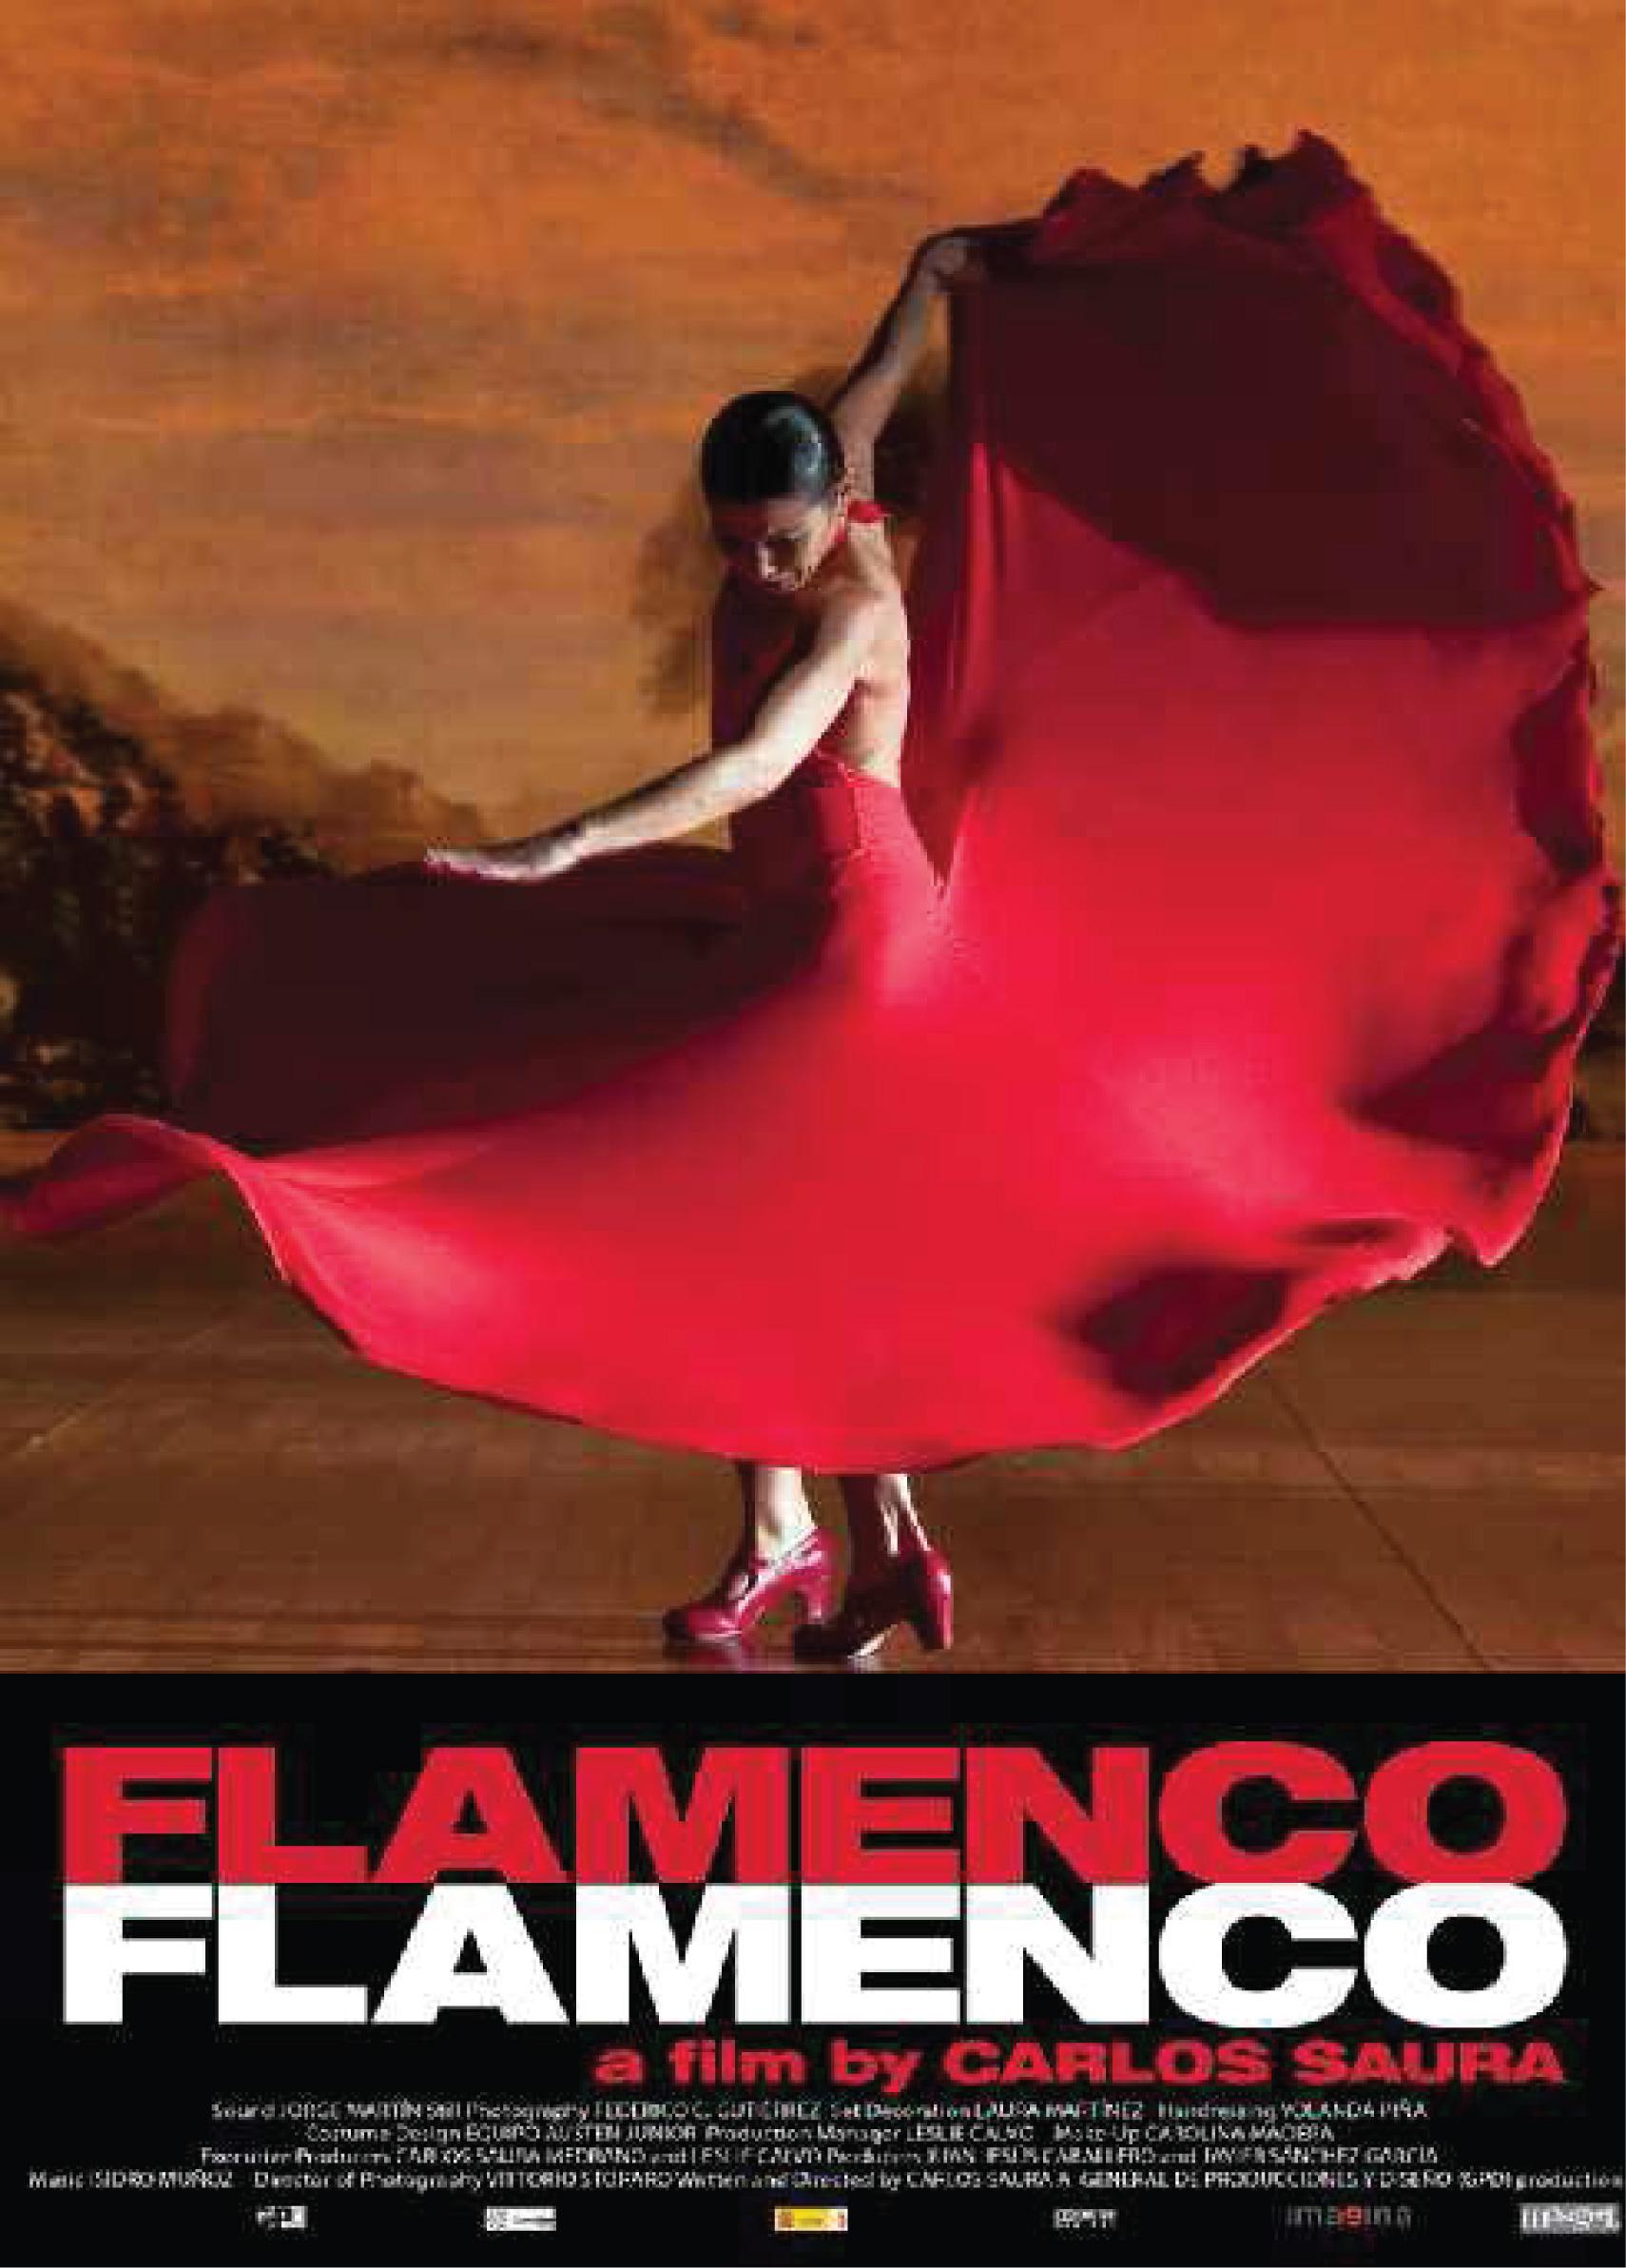 Flamenko, Flamenko